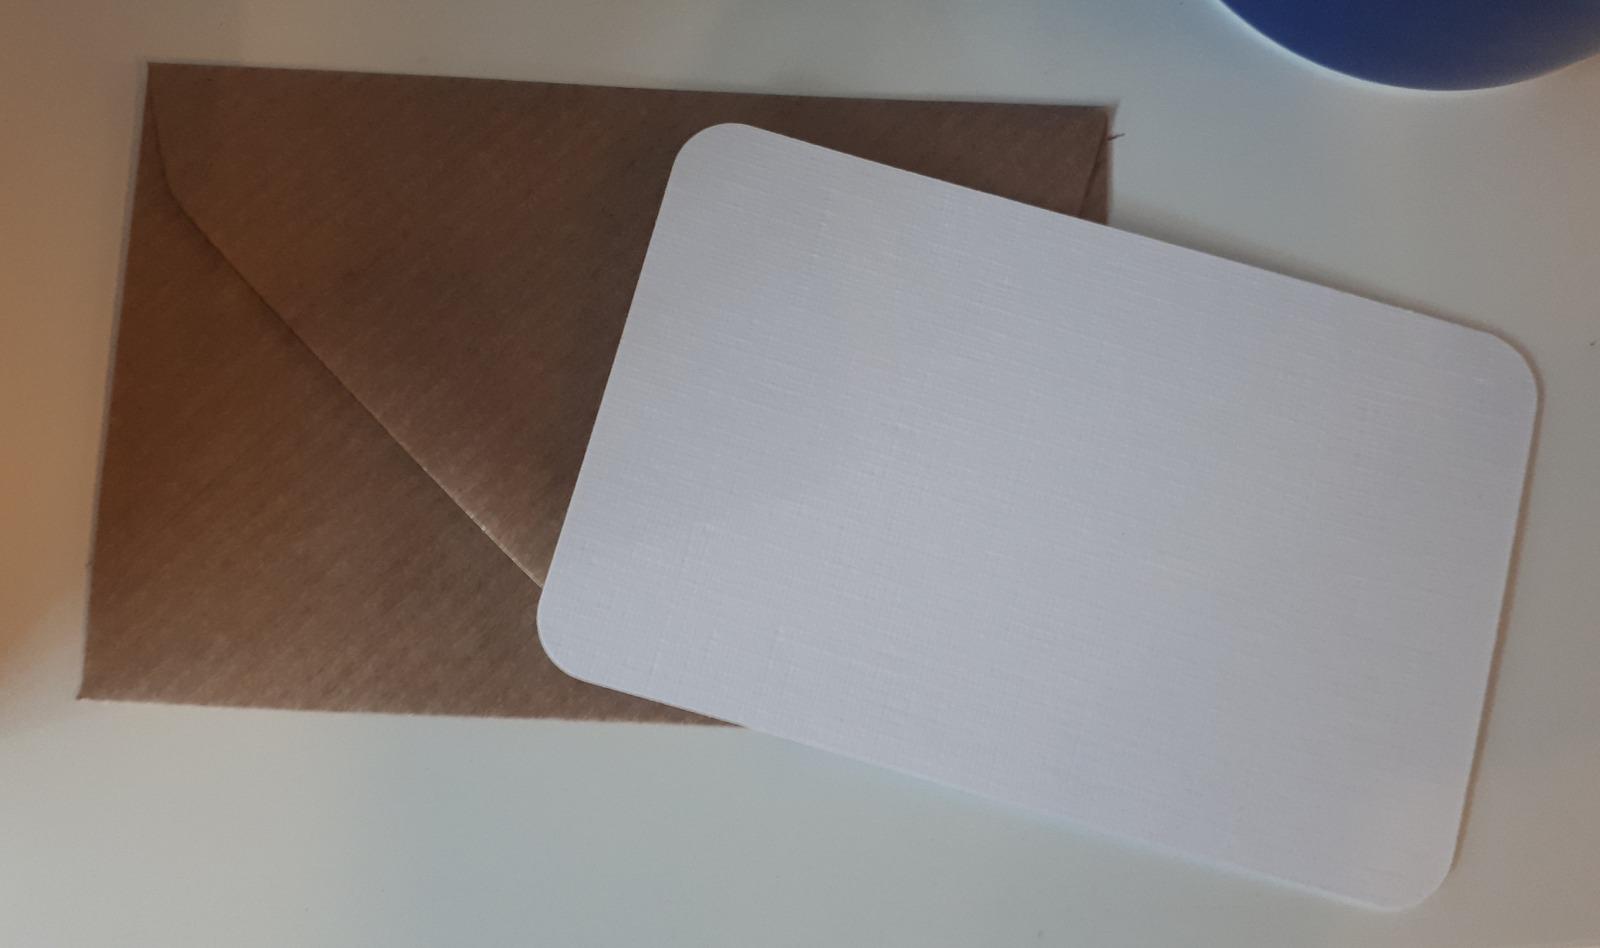 Mini-Karte Gute Besserung Visitenkartenformat MK-05 3